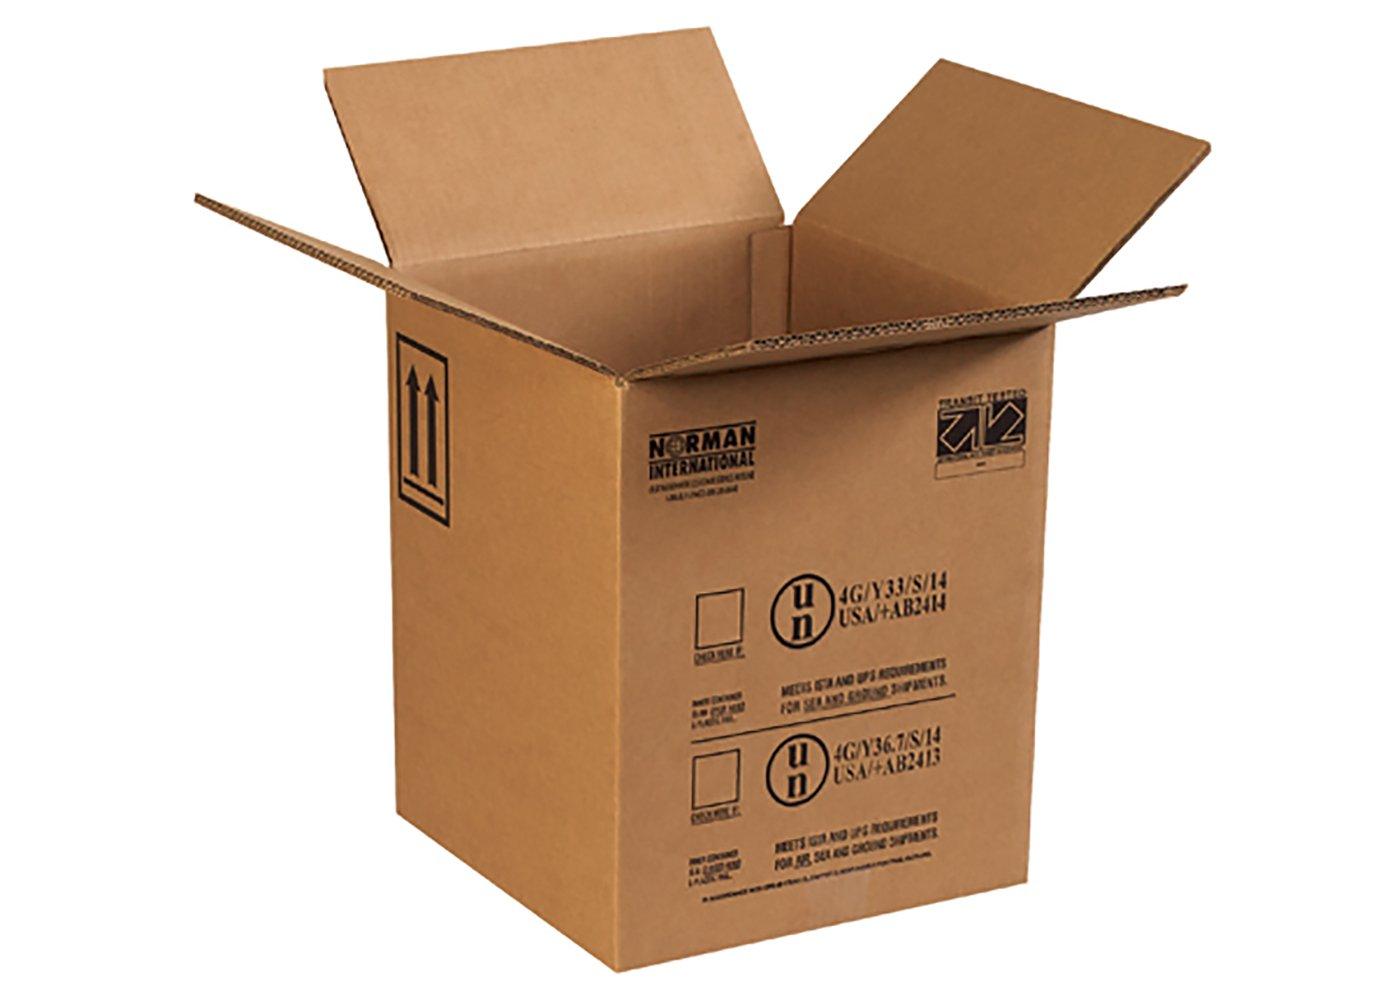 RetailSource B121215HM160 Hazmat Box, 15.125'' Height, 12.5'' Width, 12.5'' Length, Brown (Pack of 160)